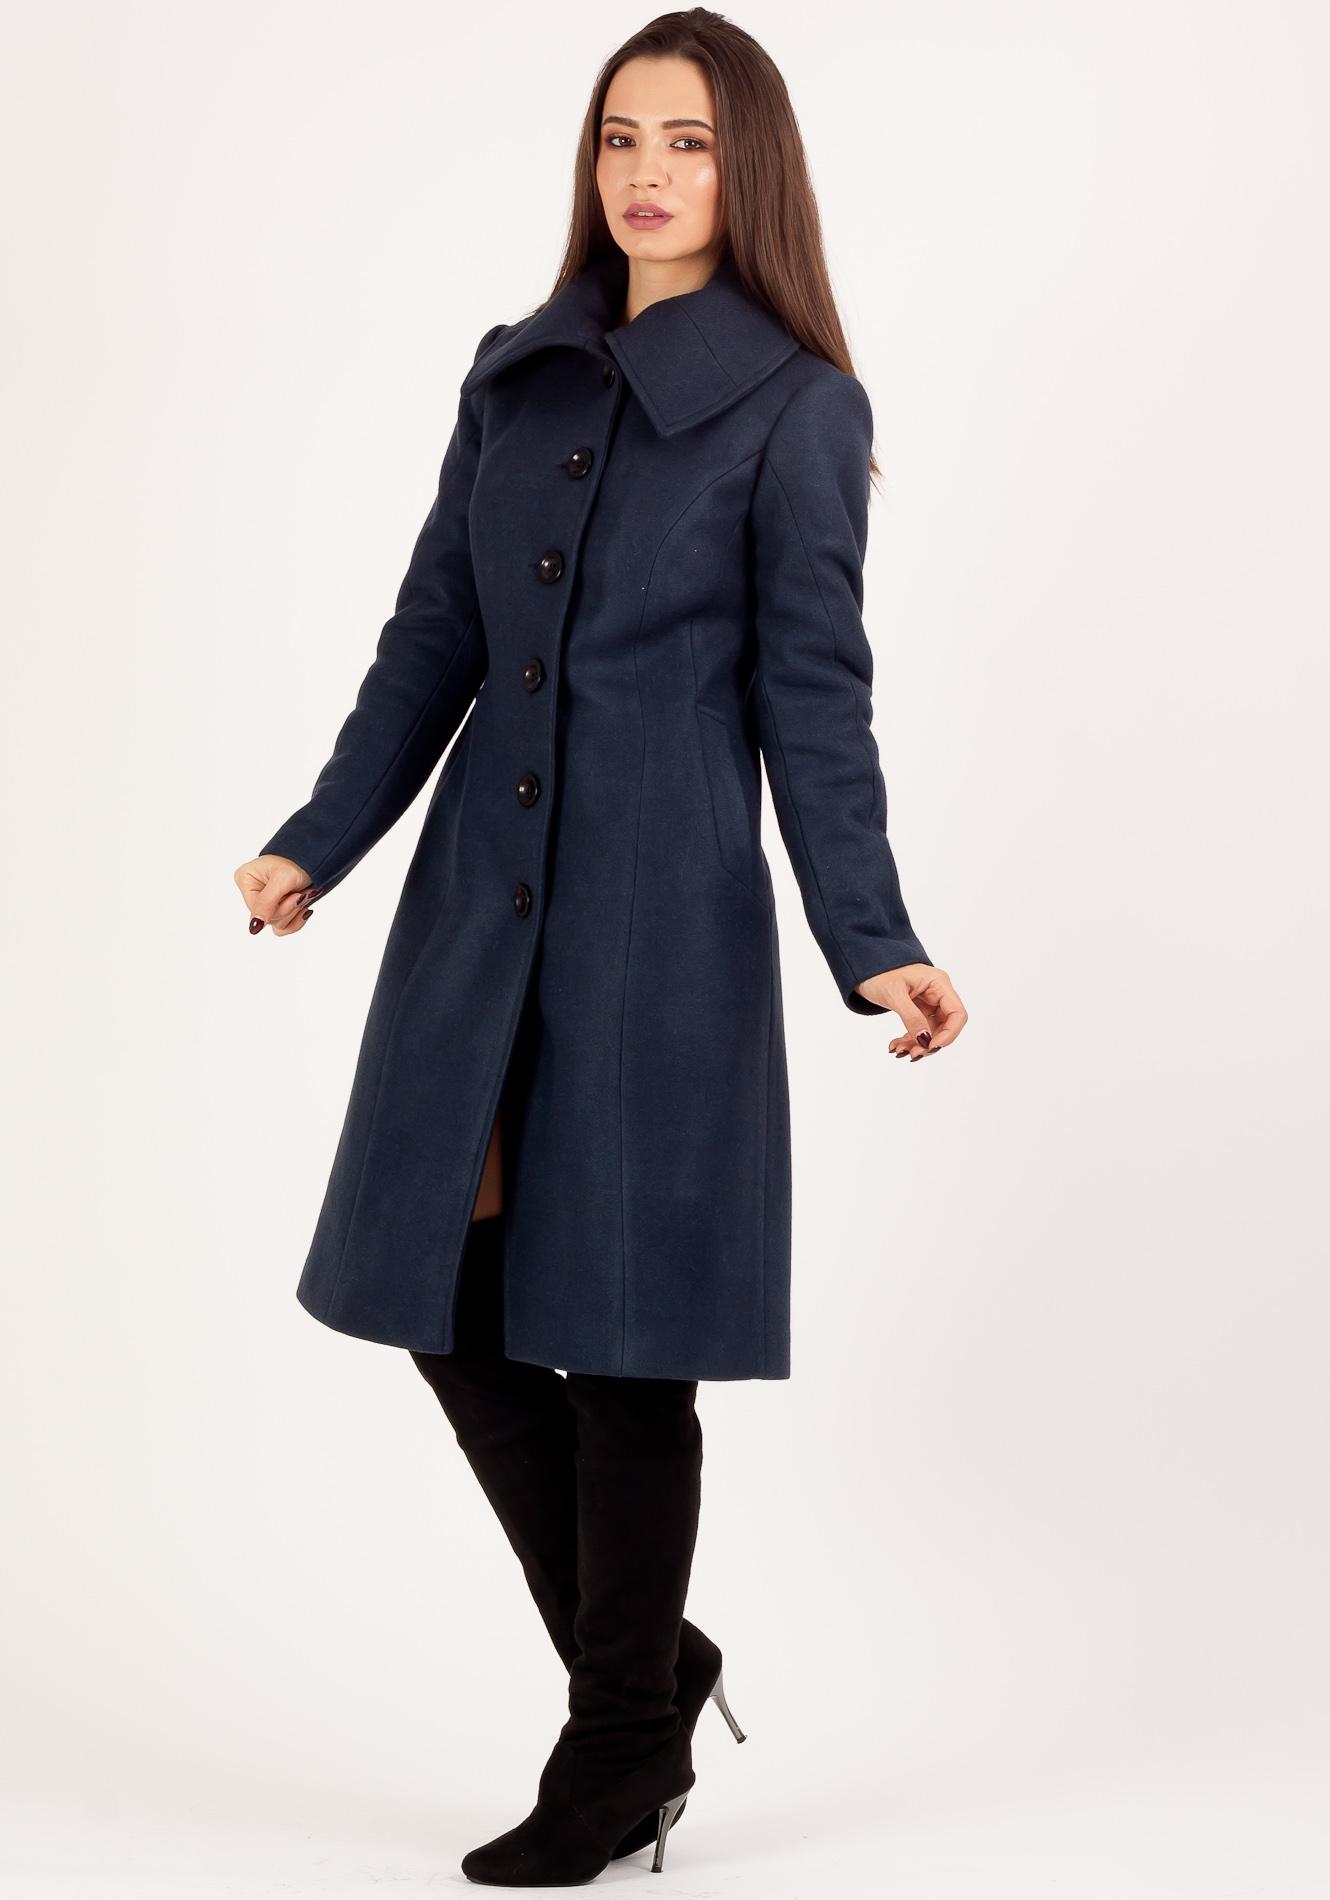 Palton Lung Bleumarin 36